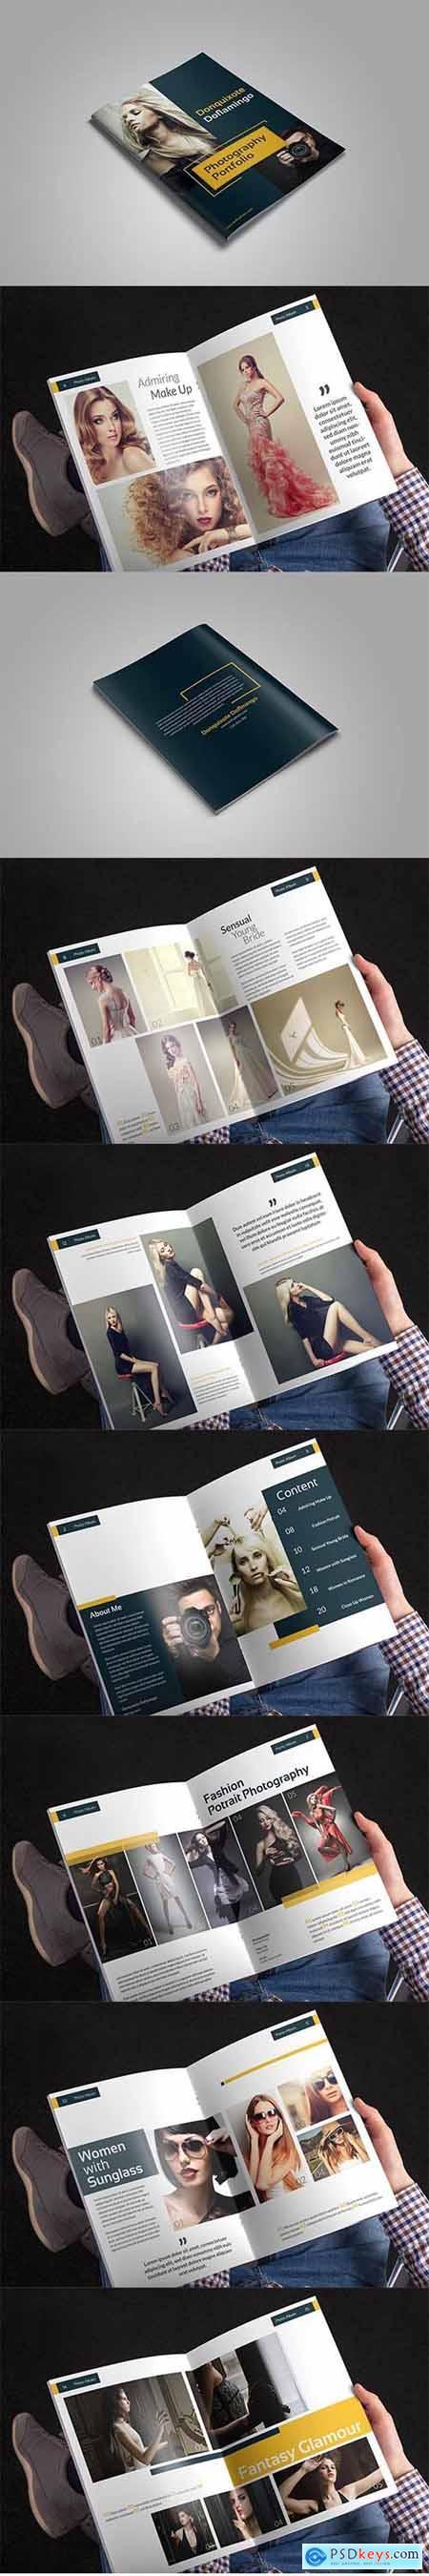 HQ - Photography Portfolio